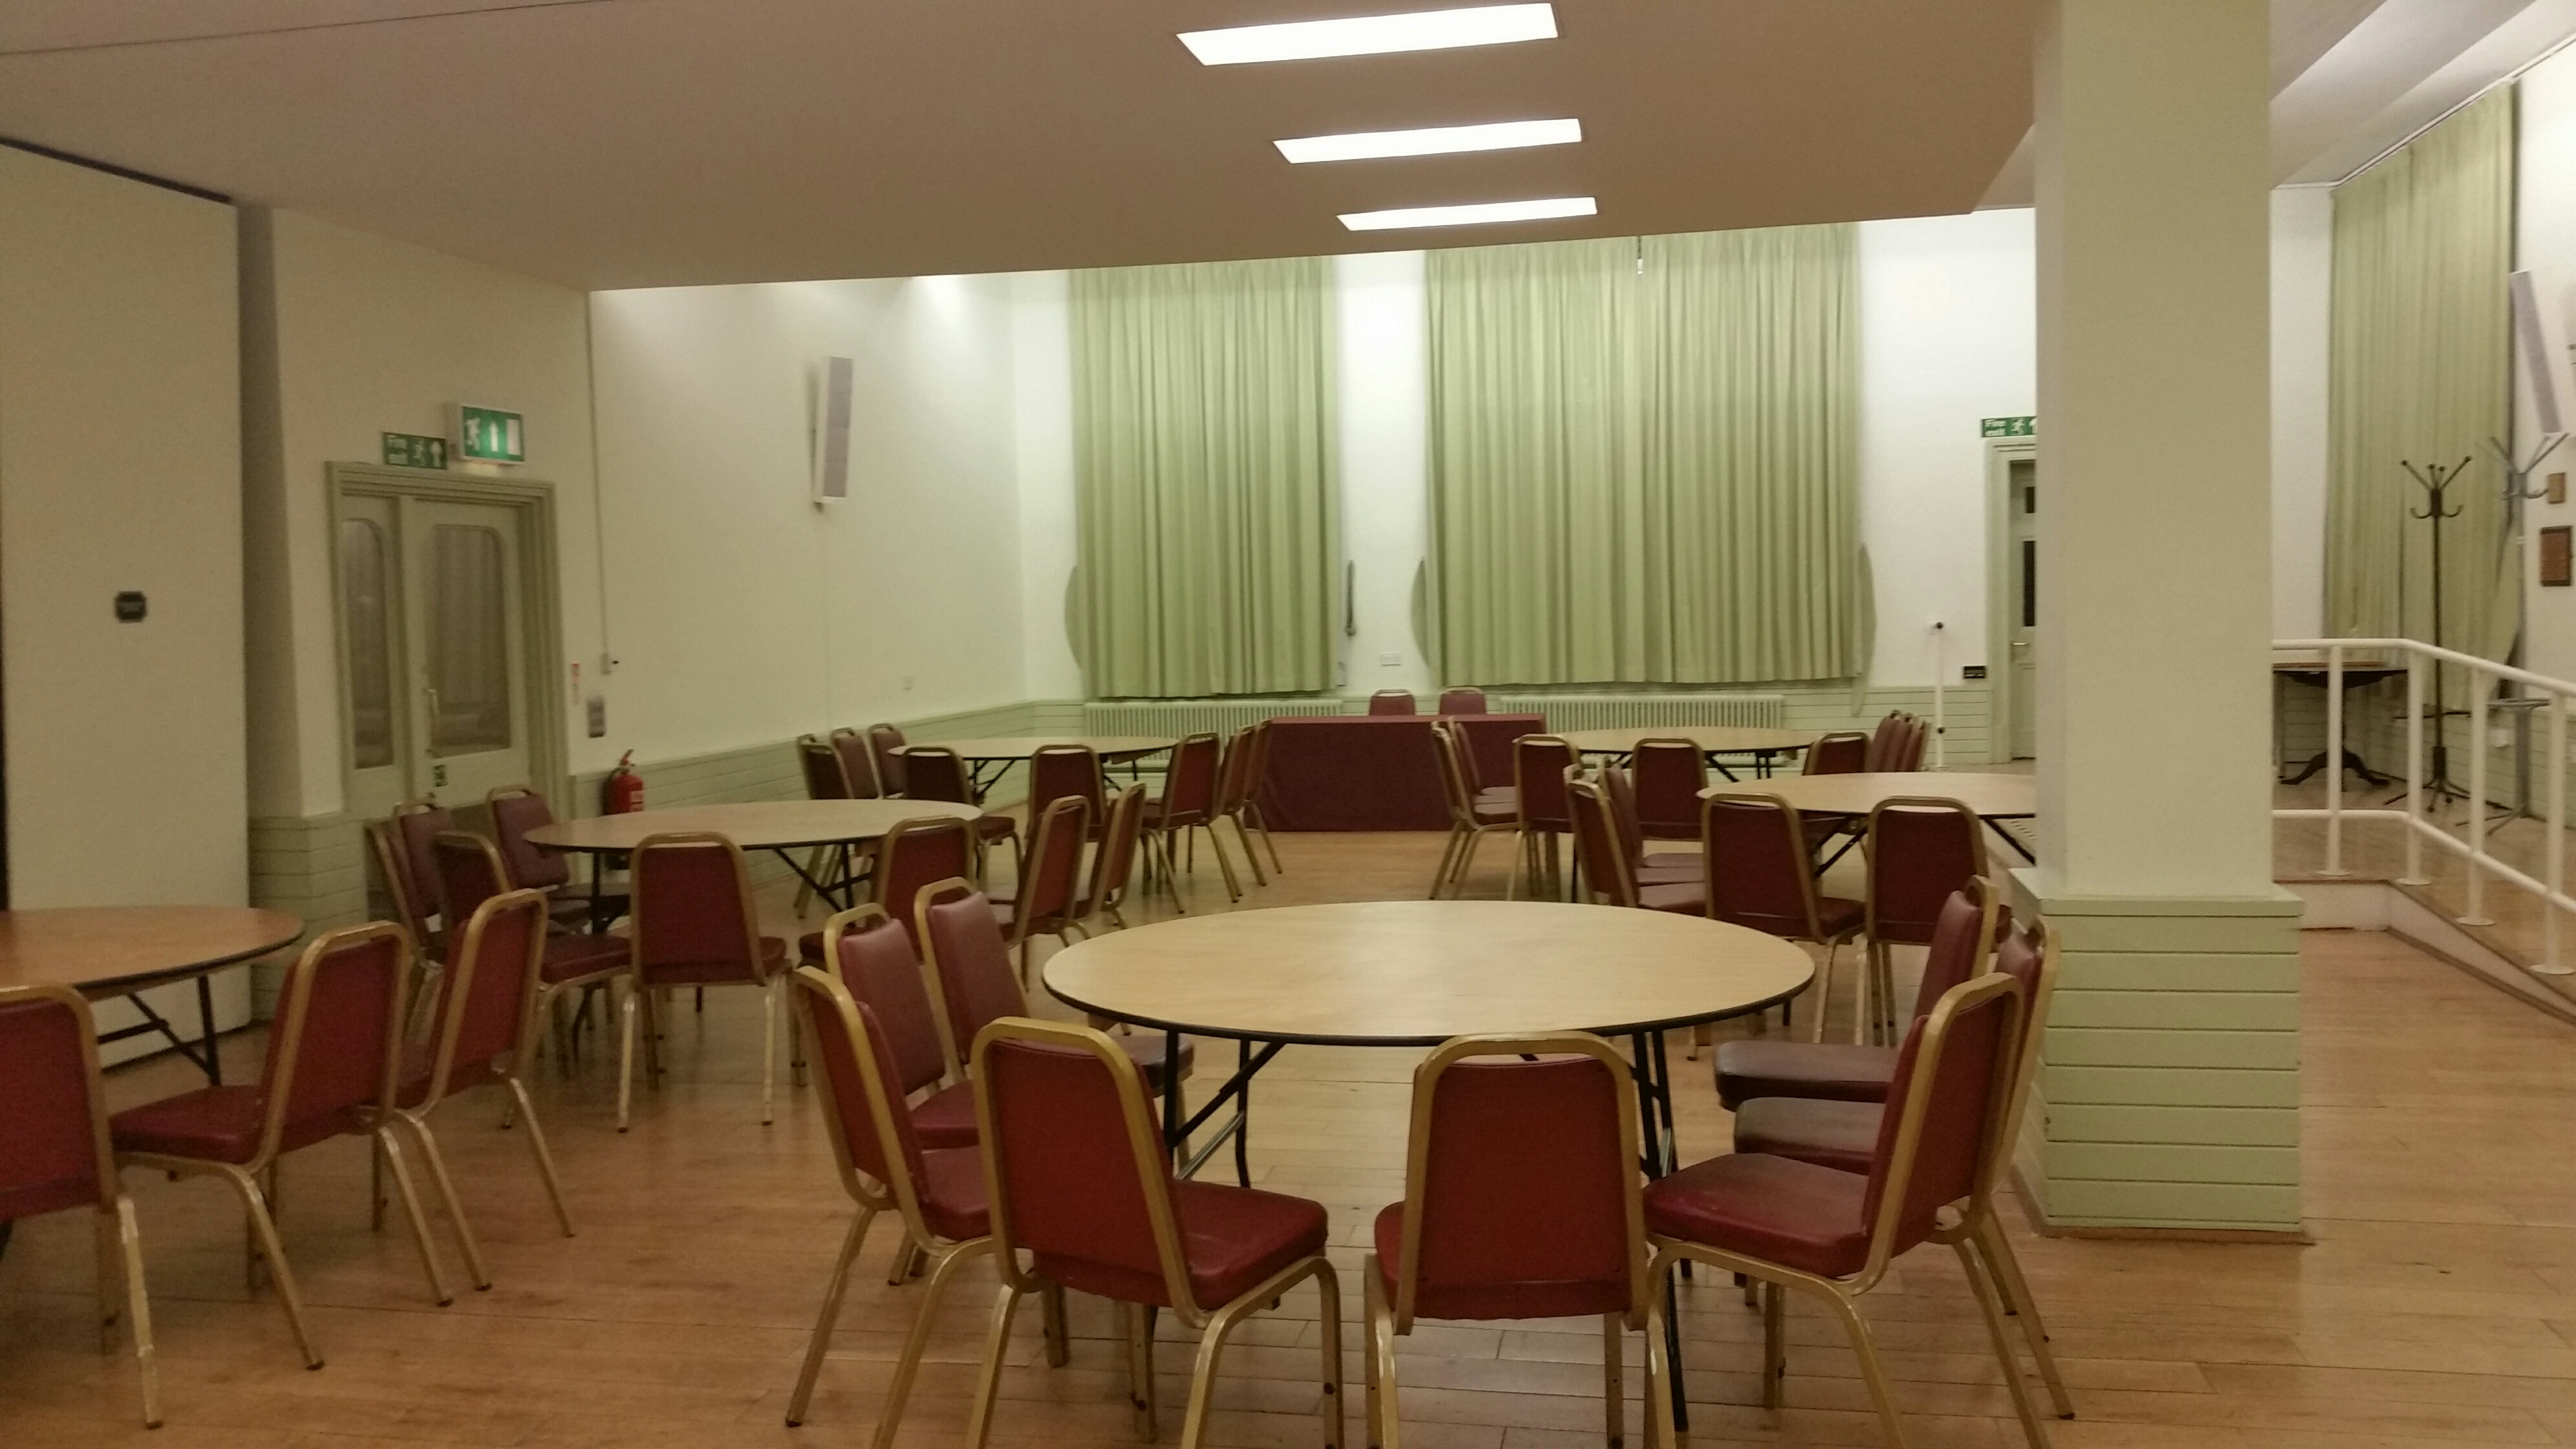 Liz Cantell Room Ealing Venues